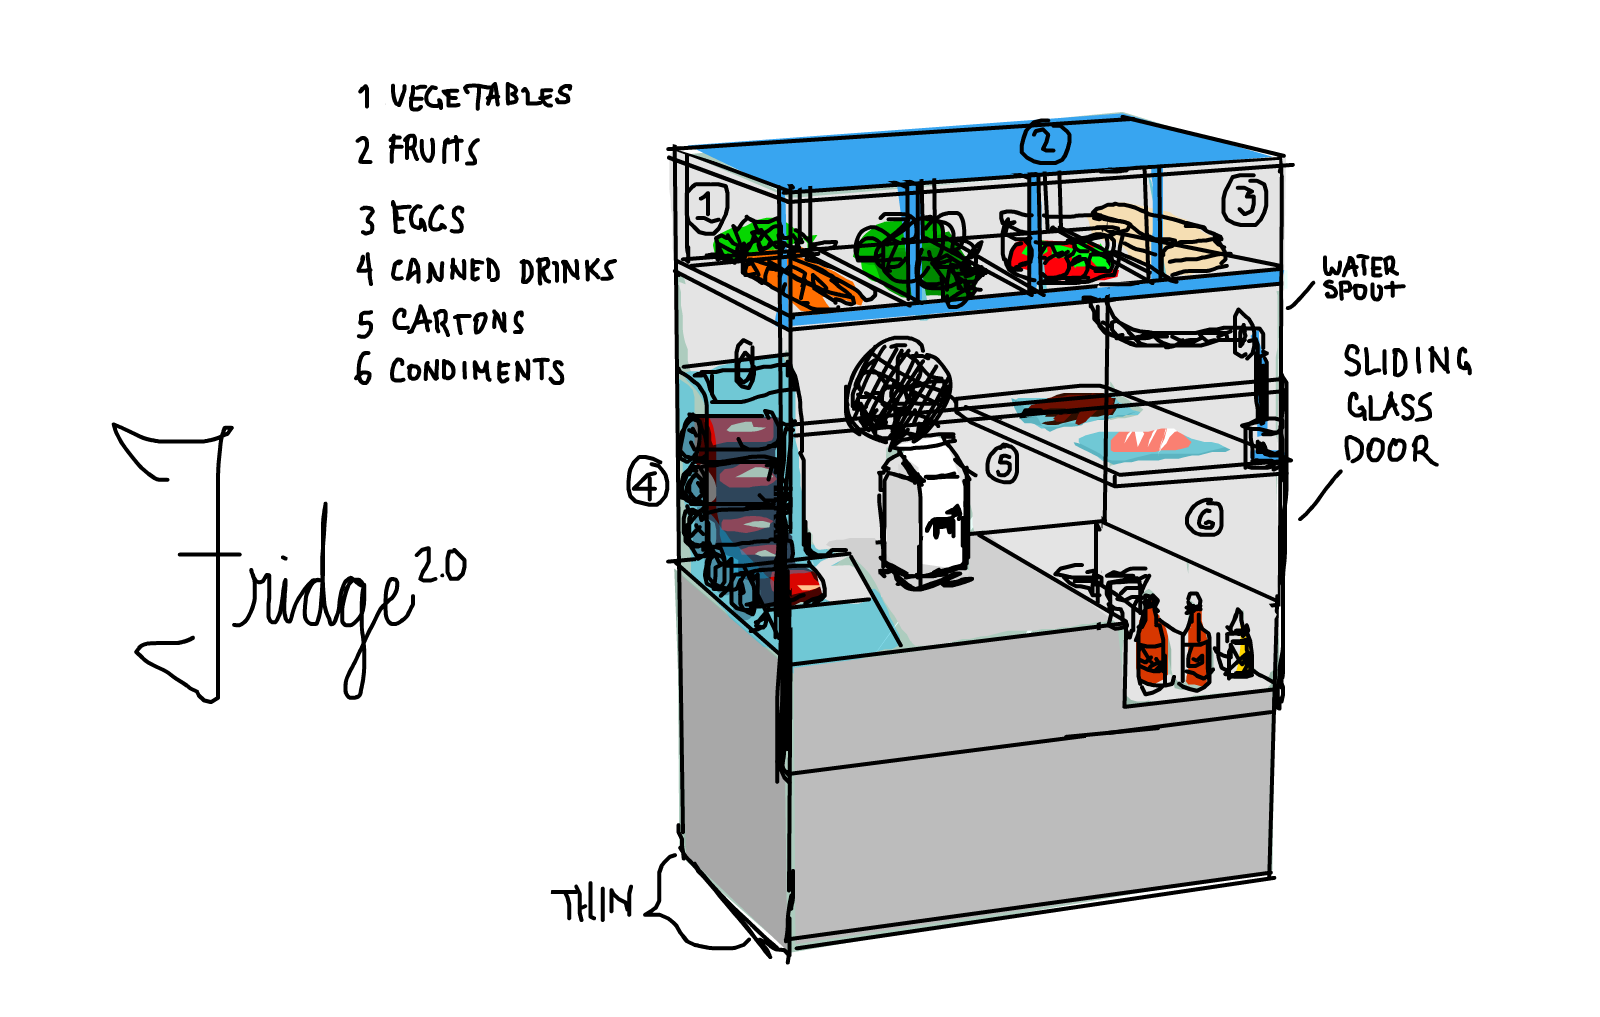 fridge by magicalhobo on sketchport